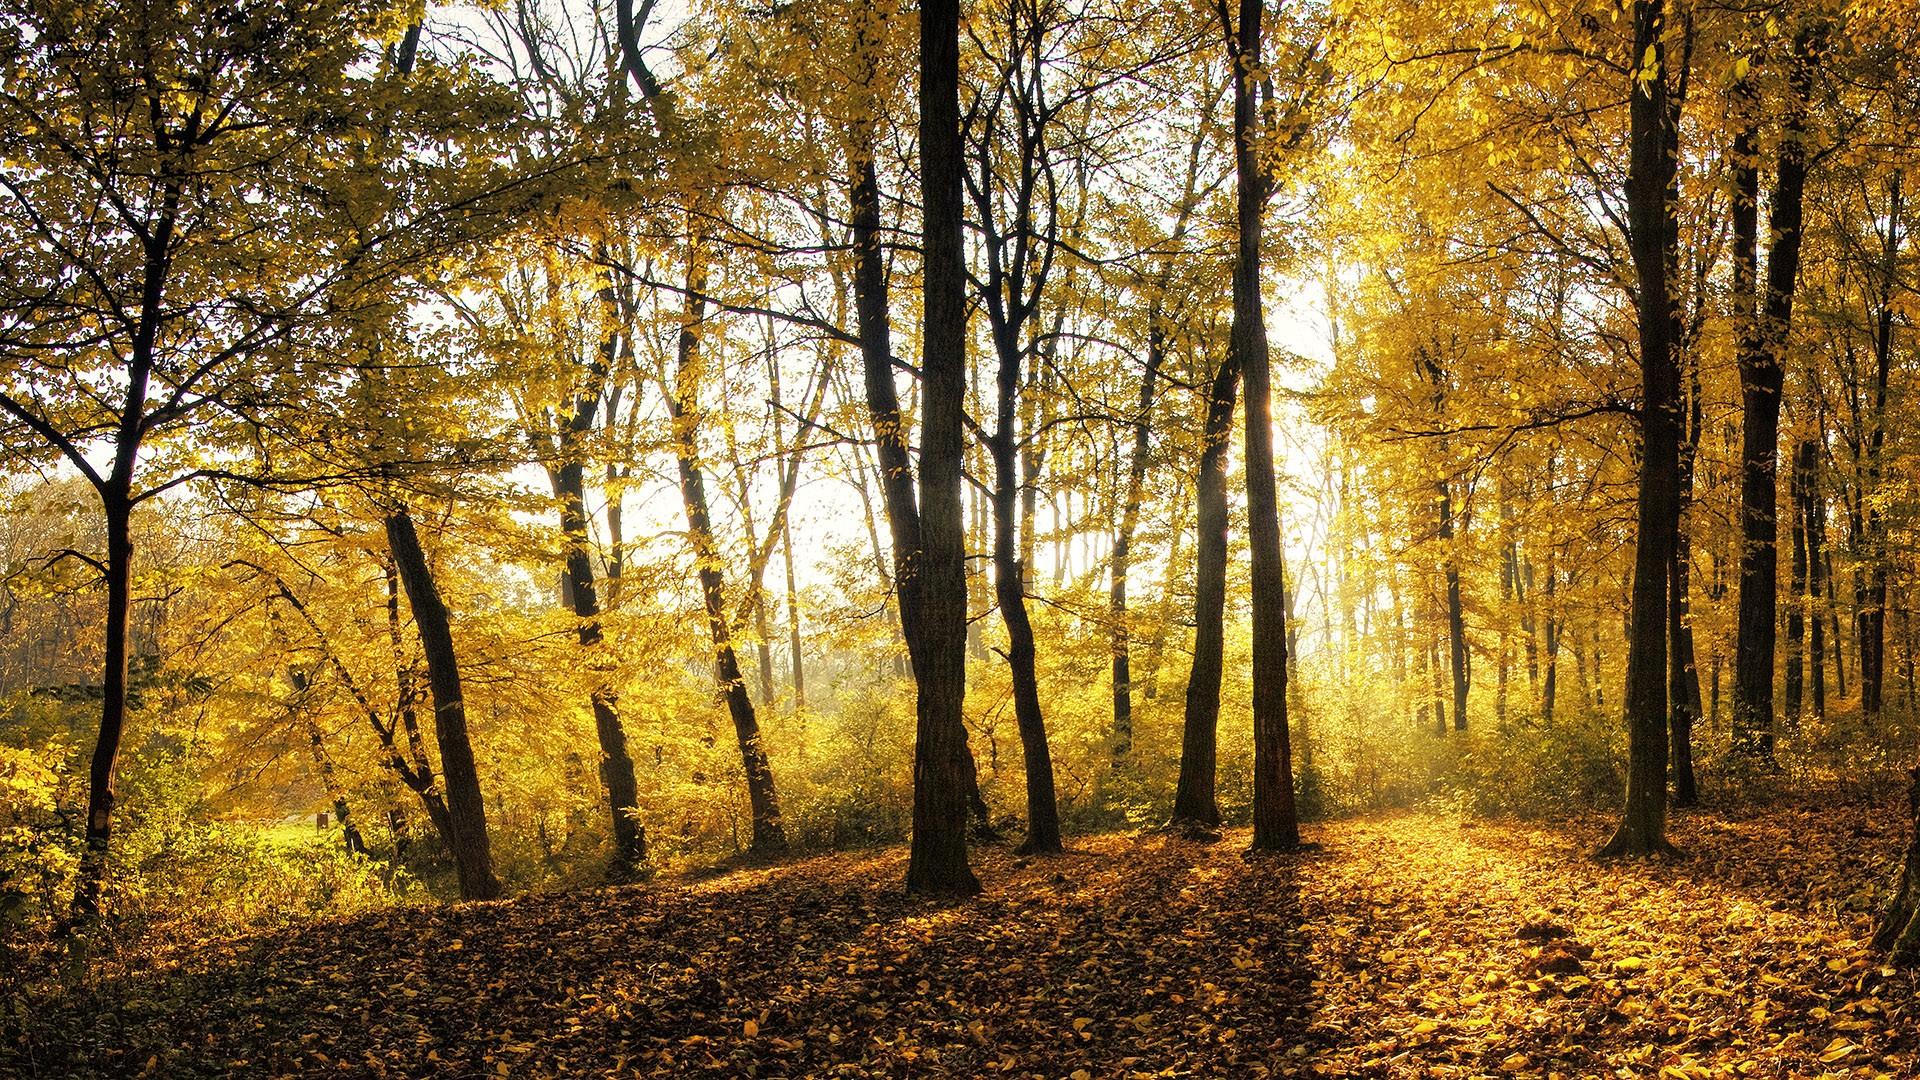 Popular Wallpaper High Resolution Forest - forest-landscape-wallpaper-22  Pic_803667.jpg